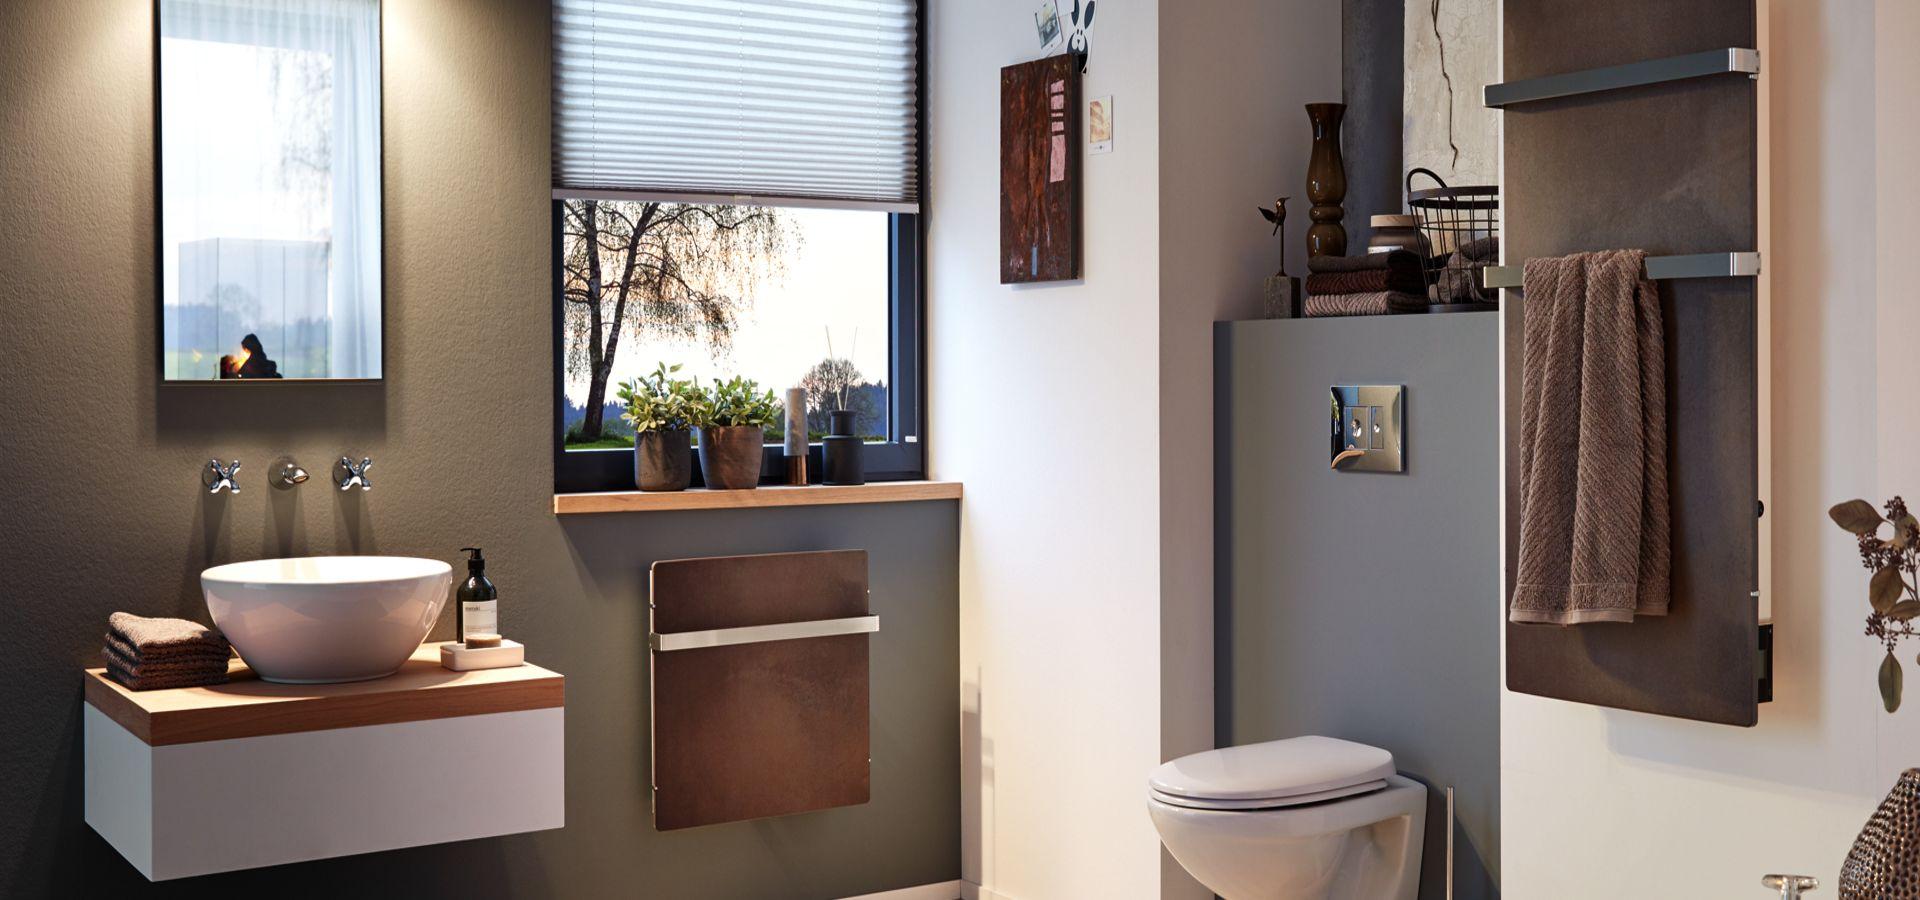 heizung k che verkleiden k che skandinavisch modern ikea papierrollenhalter kohleofen klein. Black Bedroom Furniture Sets. Home Design Ideas